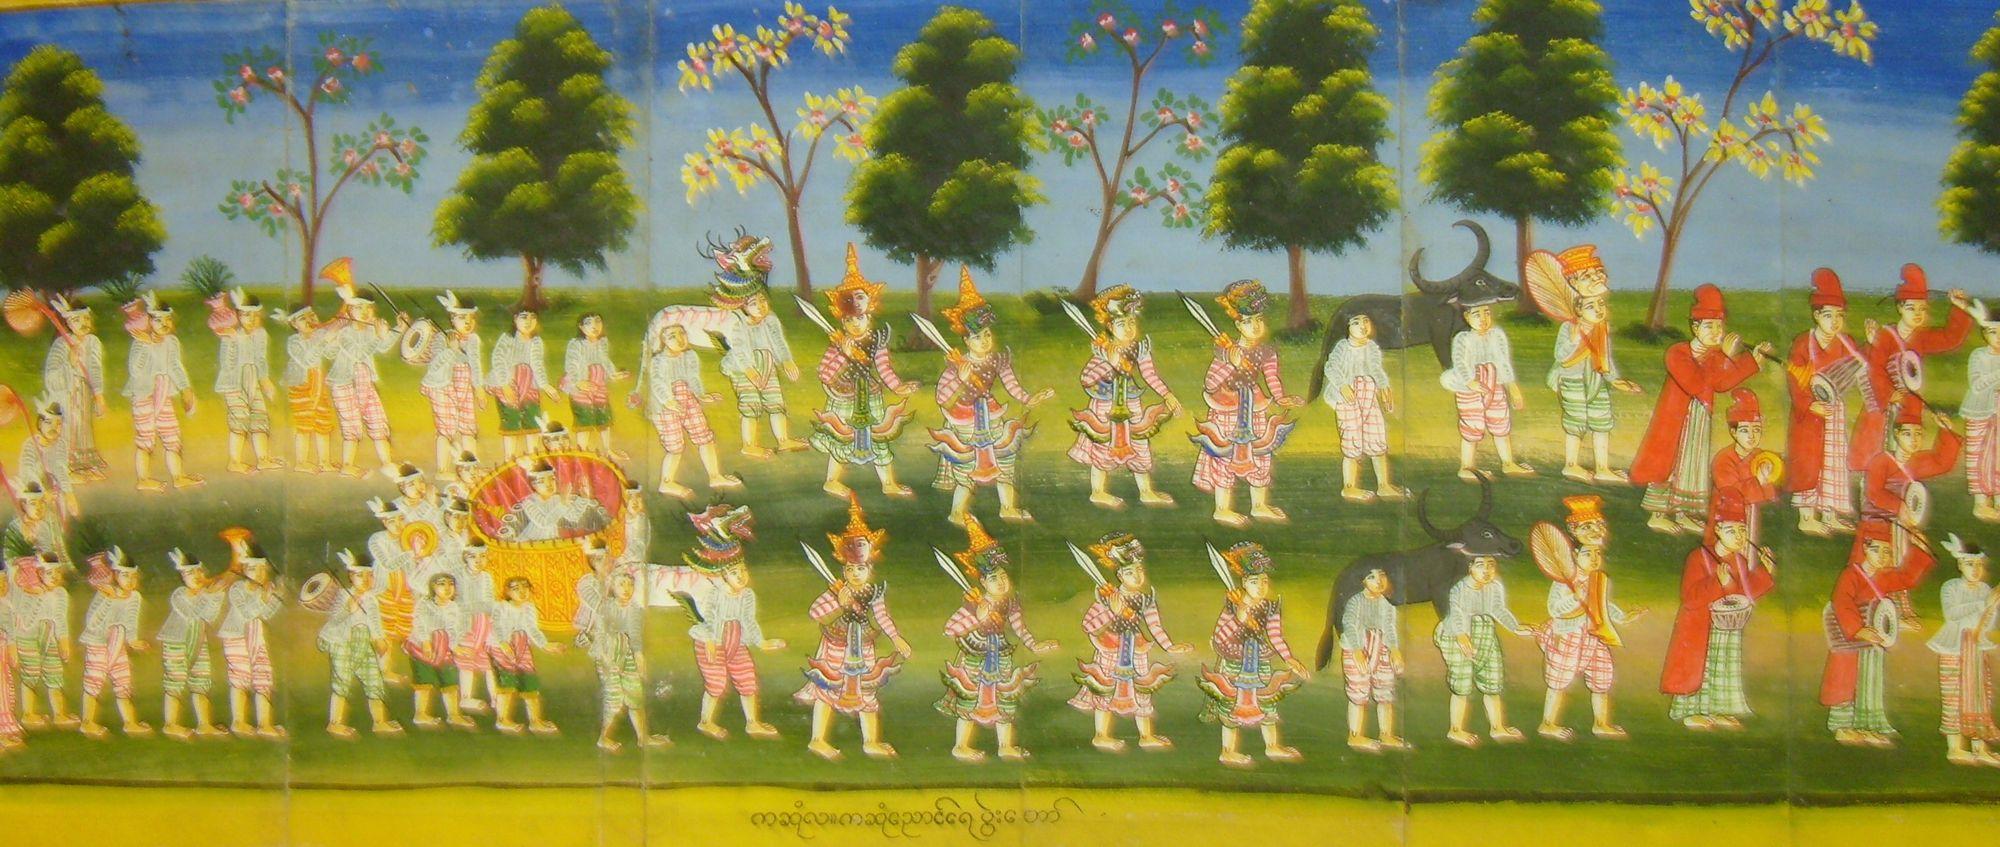 Festivals in Burma (Myanmar) - Asian and African studies blog